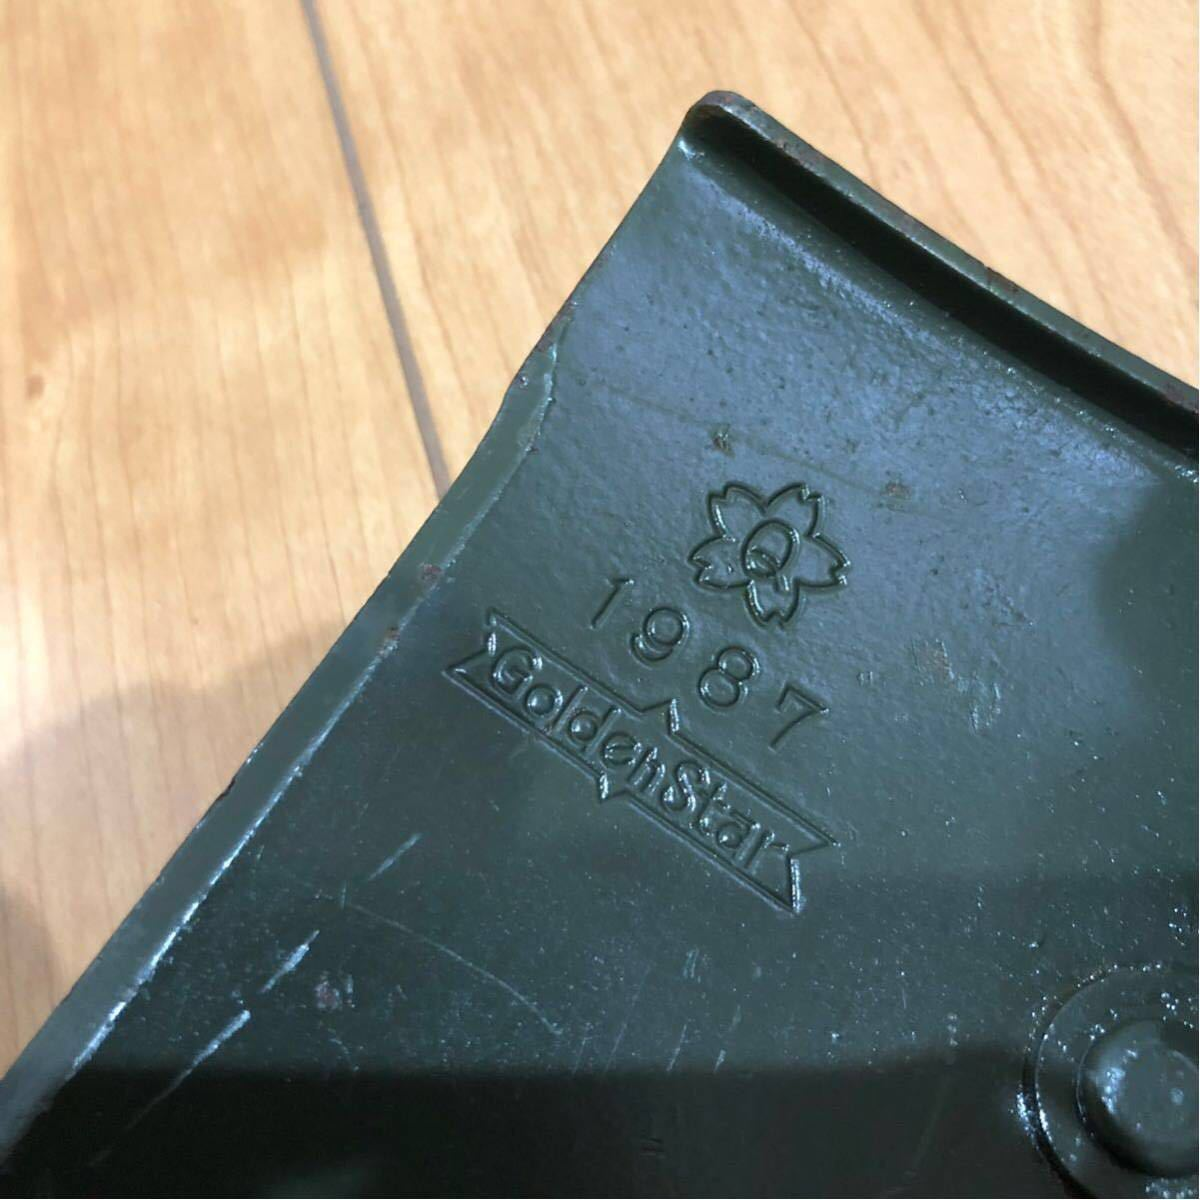 陸上自衛隊 携帯エンピ2型 スコップ 官給品 1987年度調達 中古_画像2